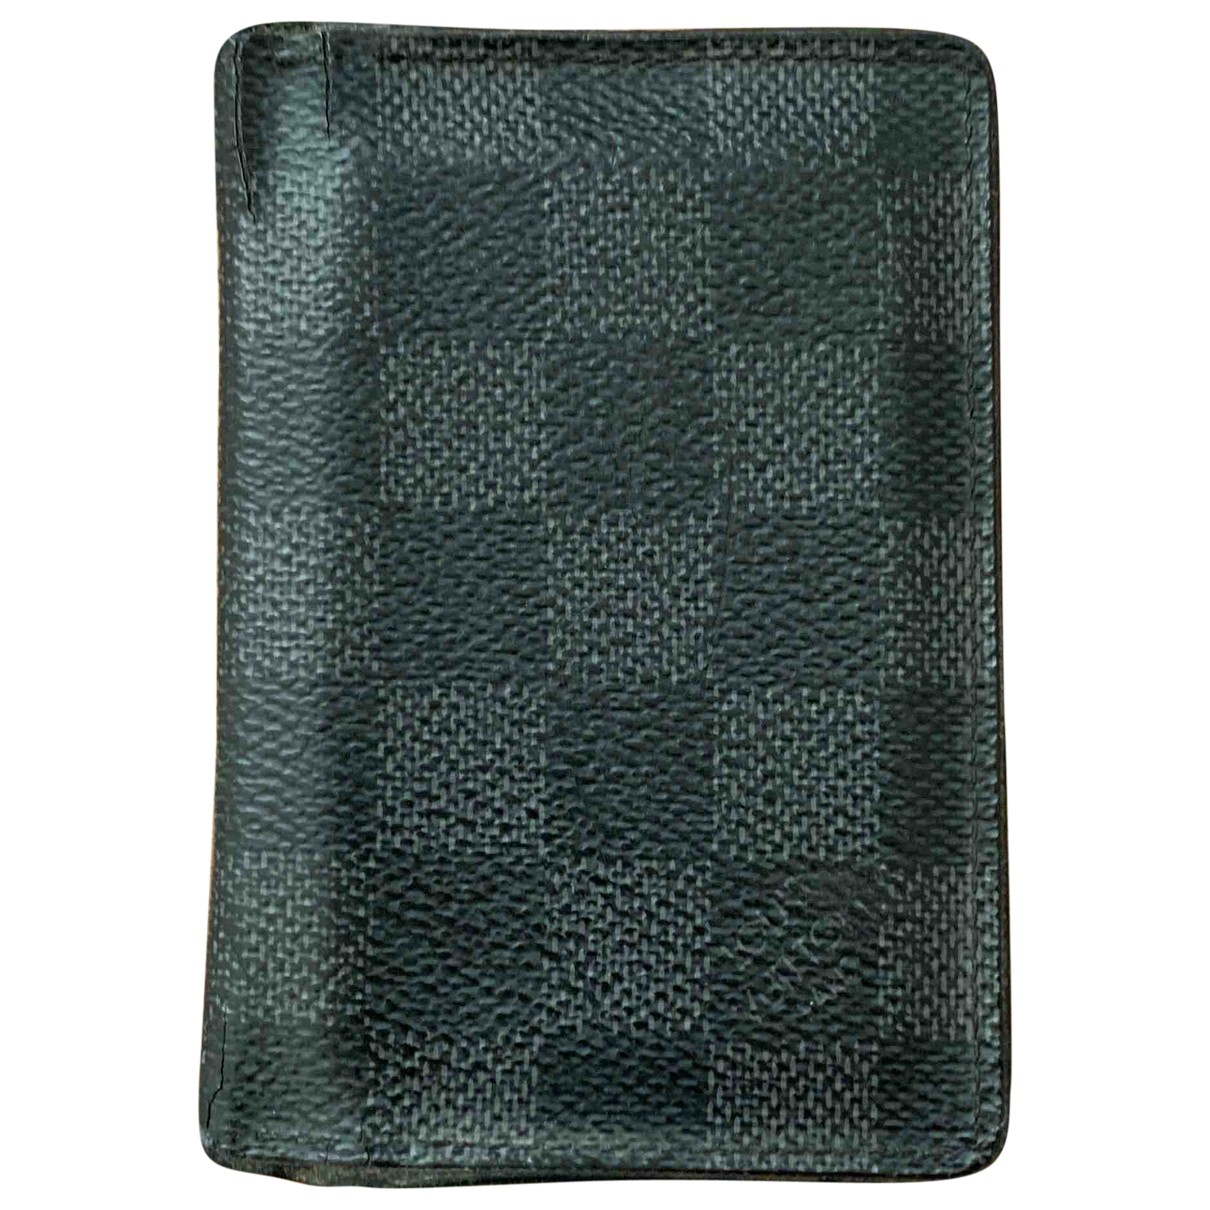 Marroquineria Pocket Organizer de Lona Louis Vuitton